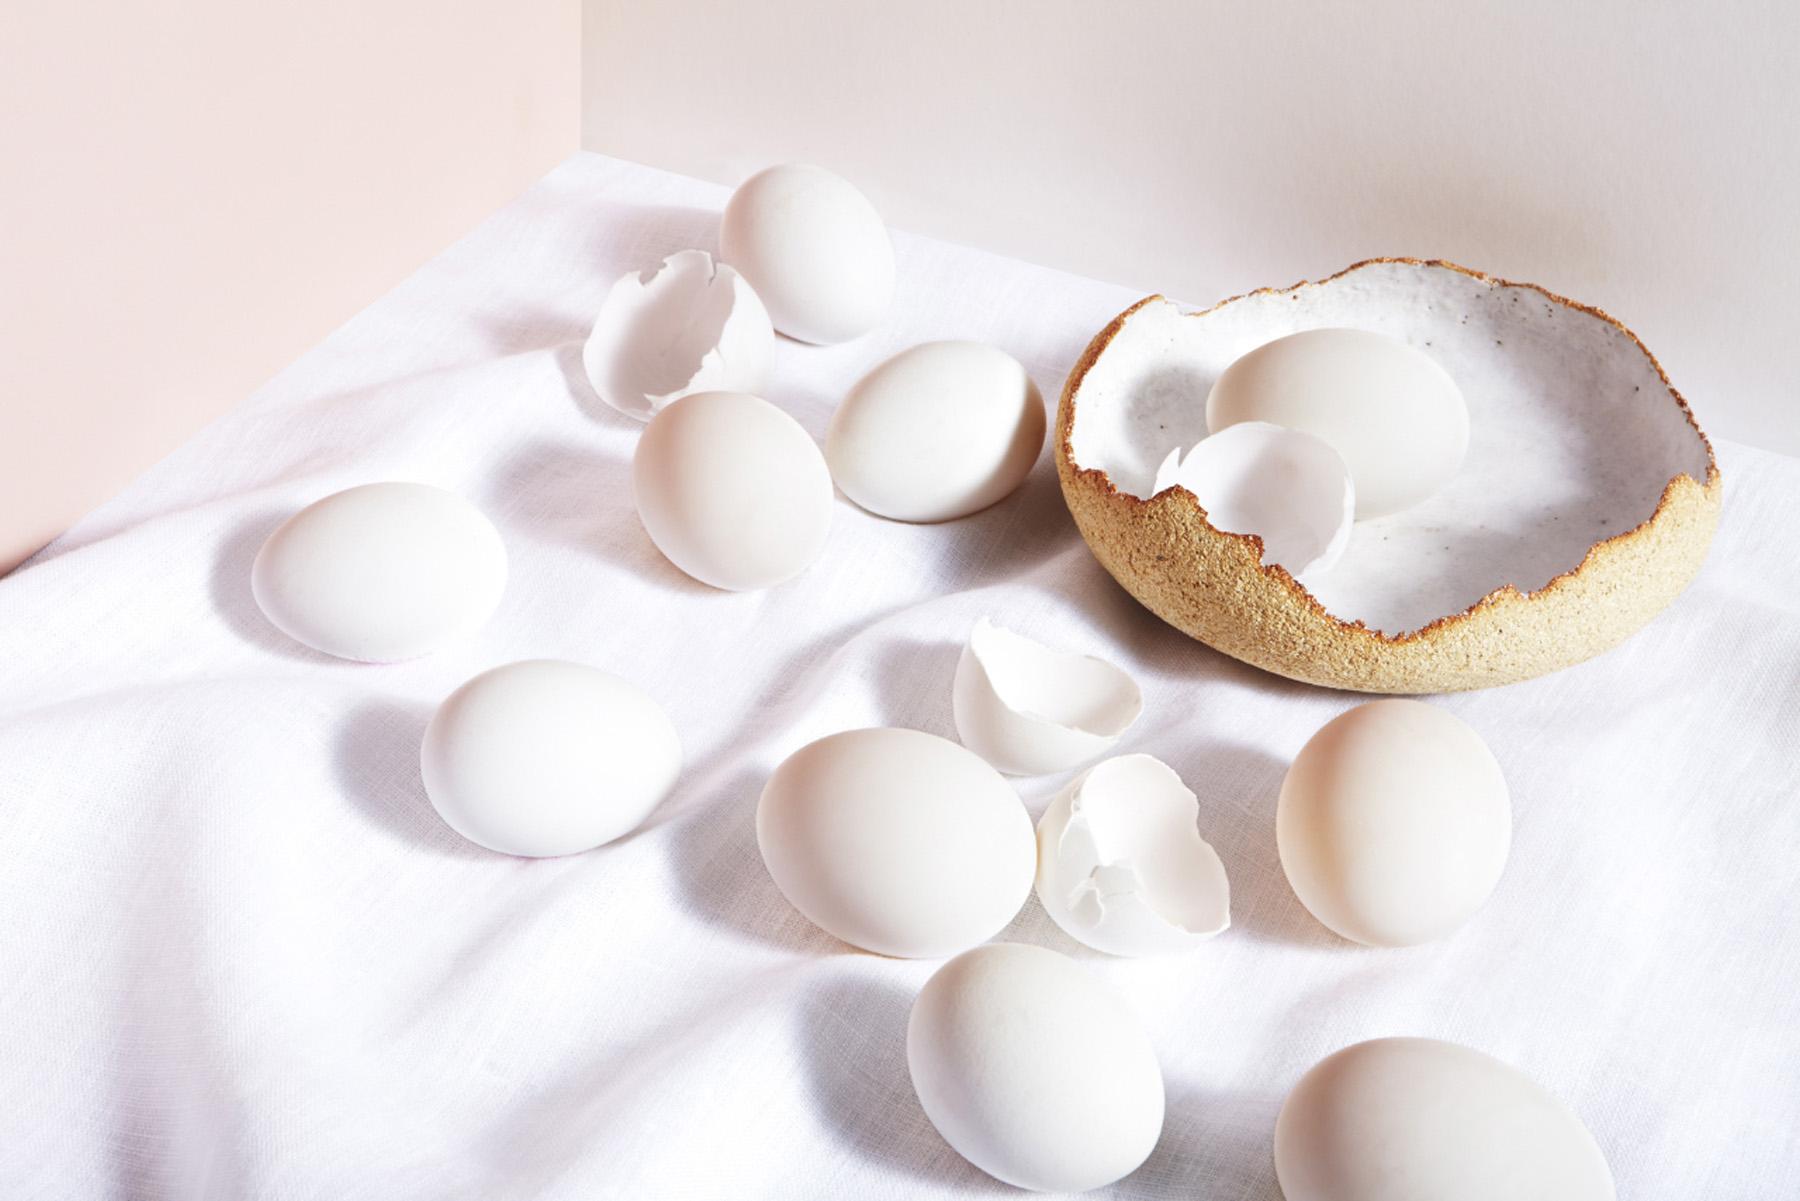 19-icon-artist-management-katie-hammond-food-white_exploration_of_eggs_ret_web.jpg